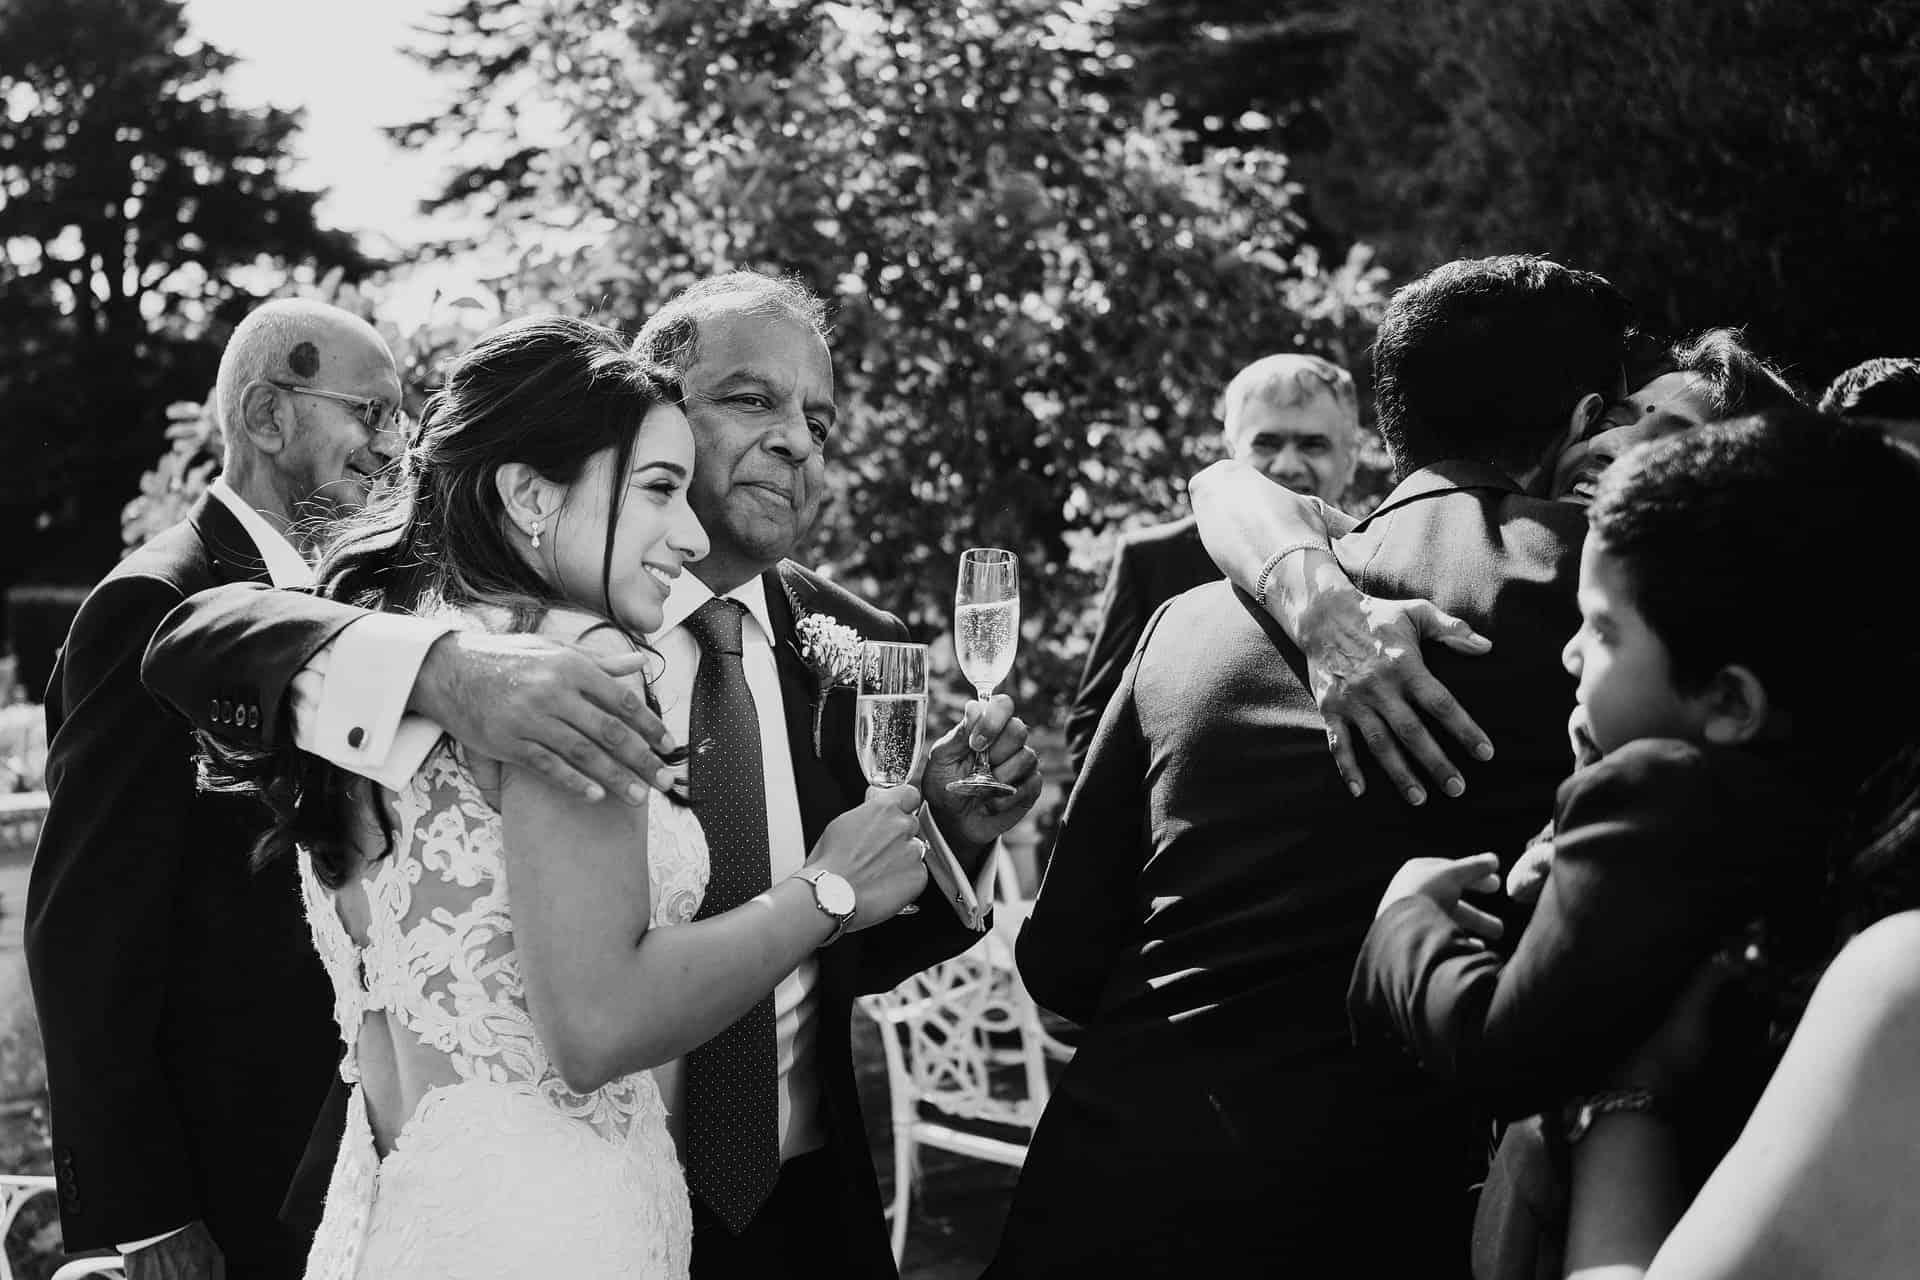 luton hoo summer wedding photographer